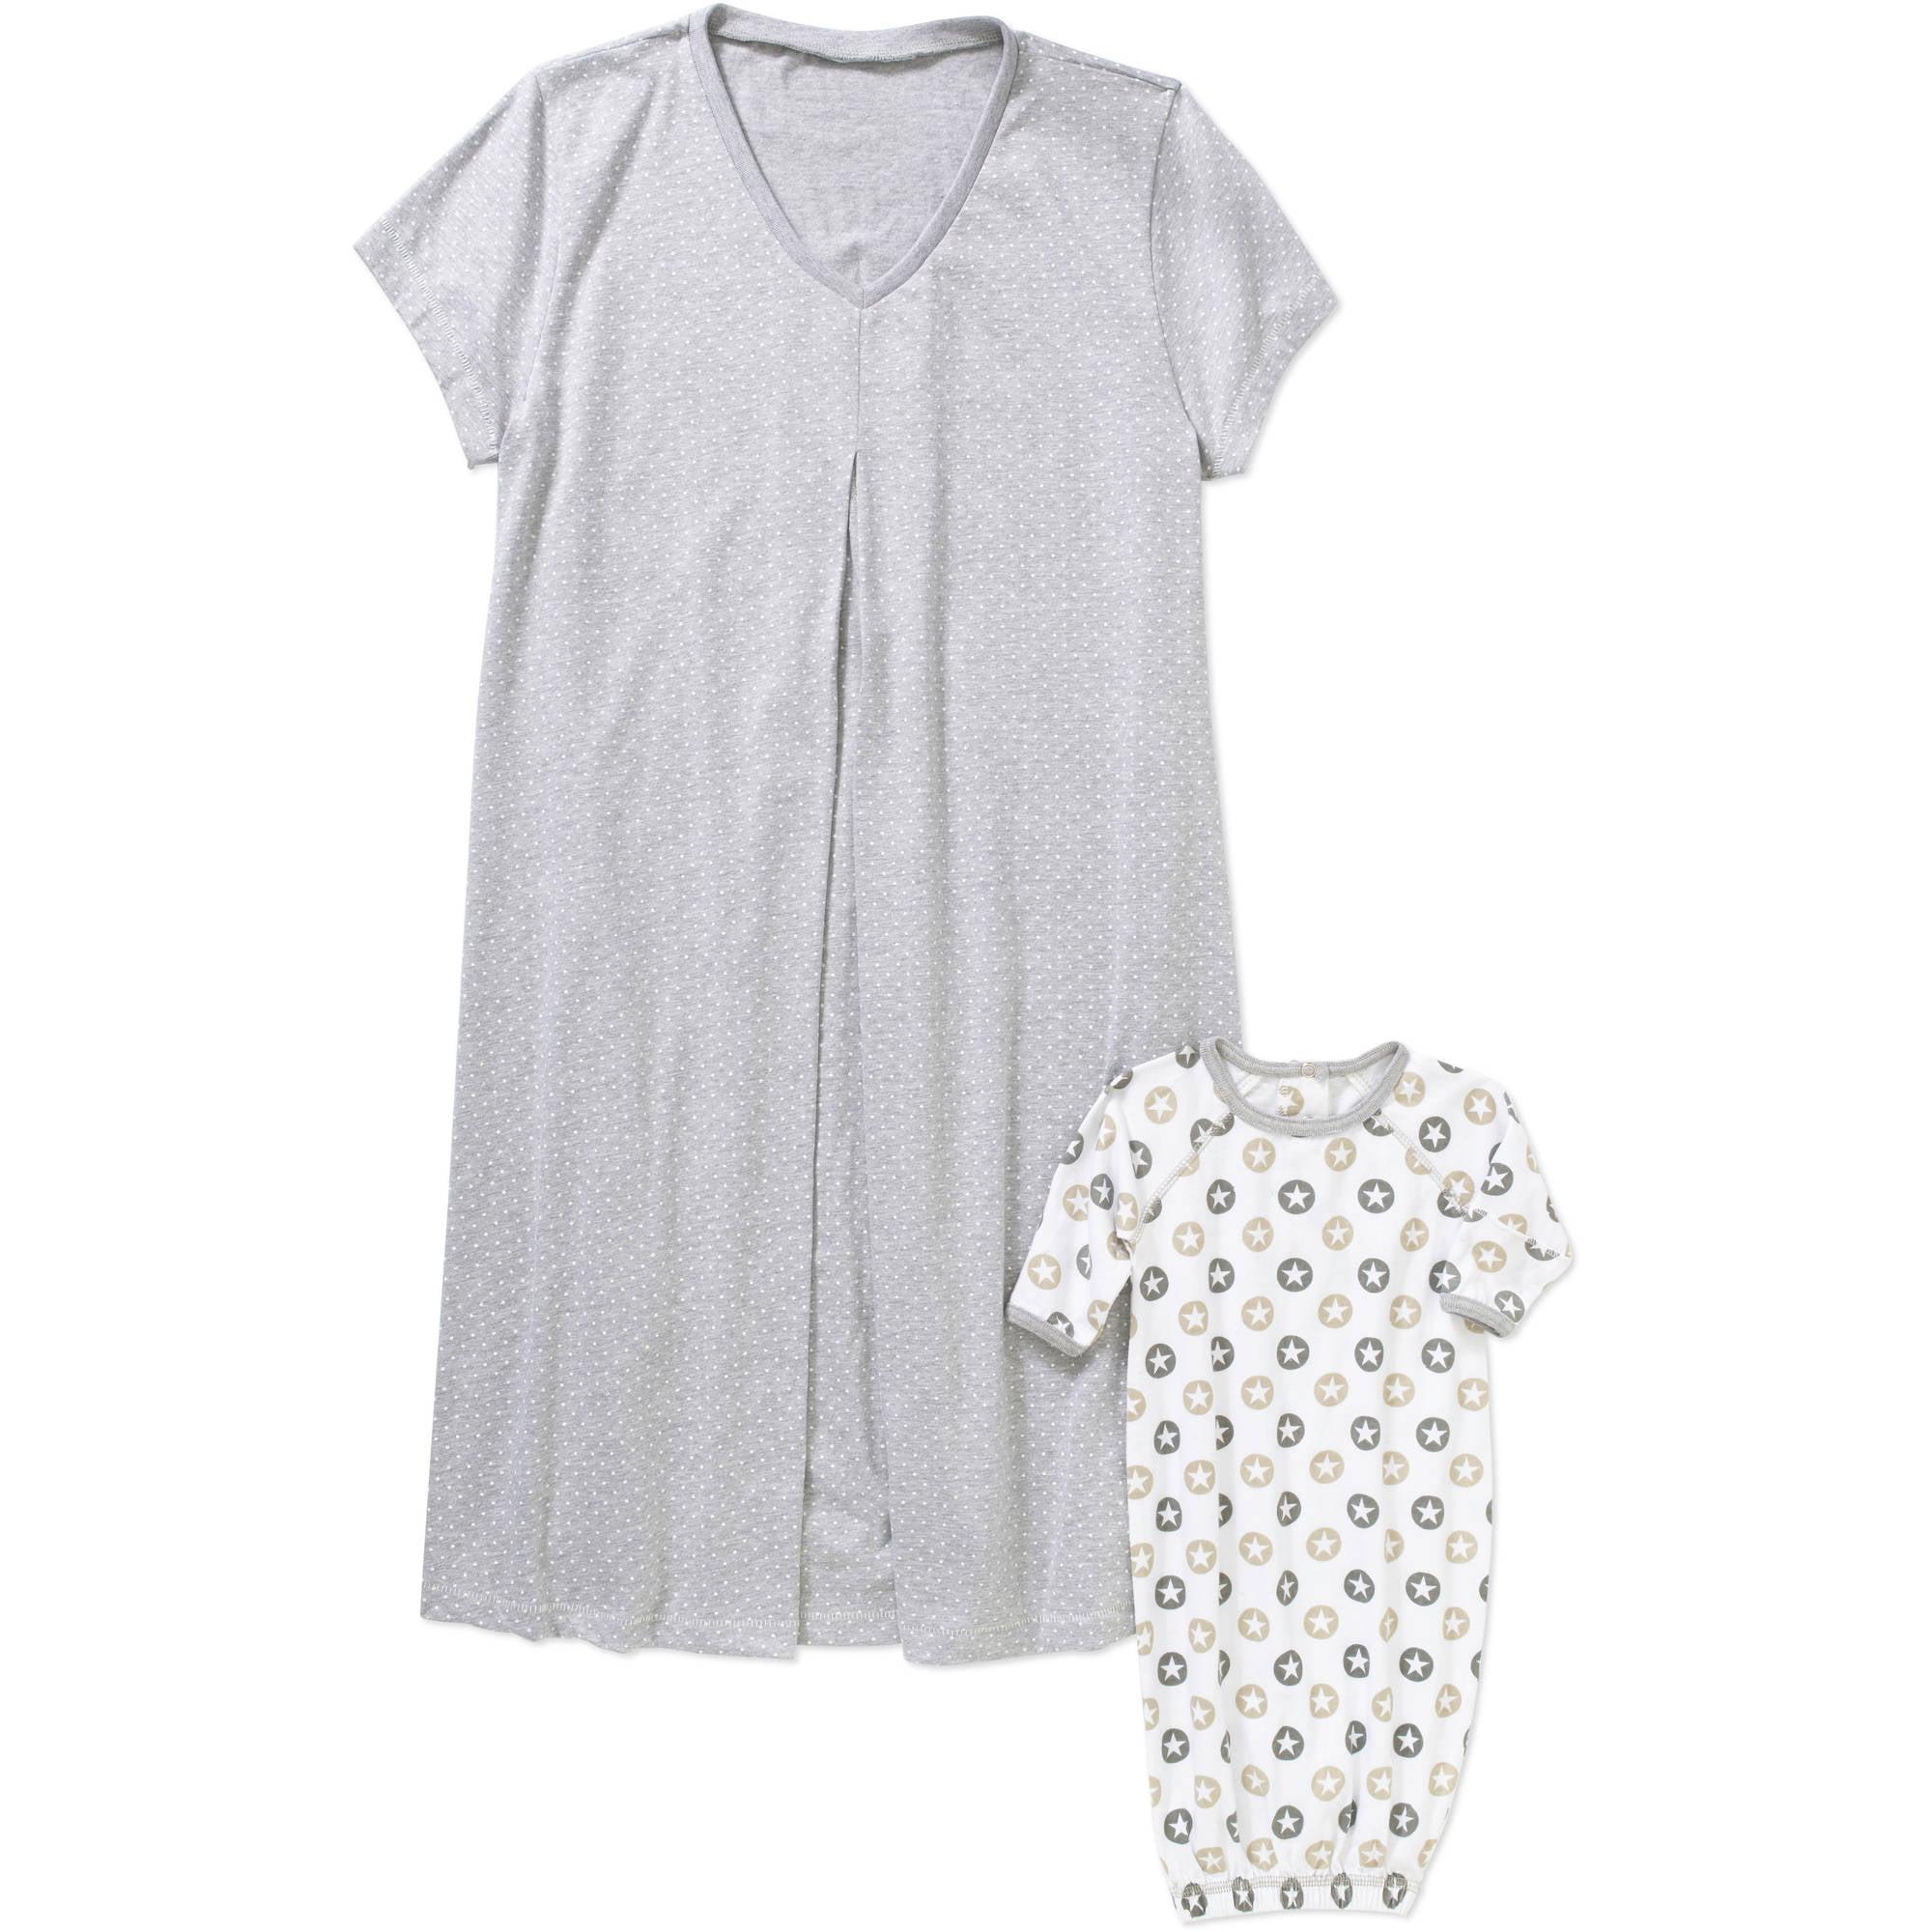 de5fcf8bc8ce5 Nurture by Lamaze - Maternity 3/4 Sleeve Henley Sleep Gown - Walmart.com